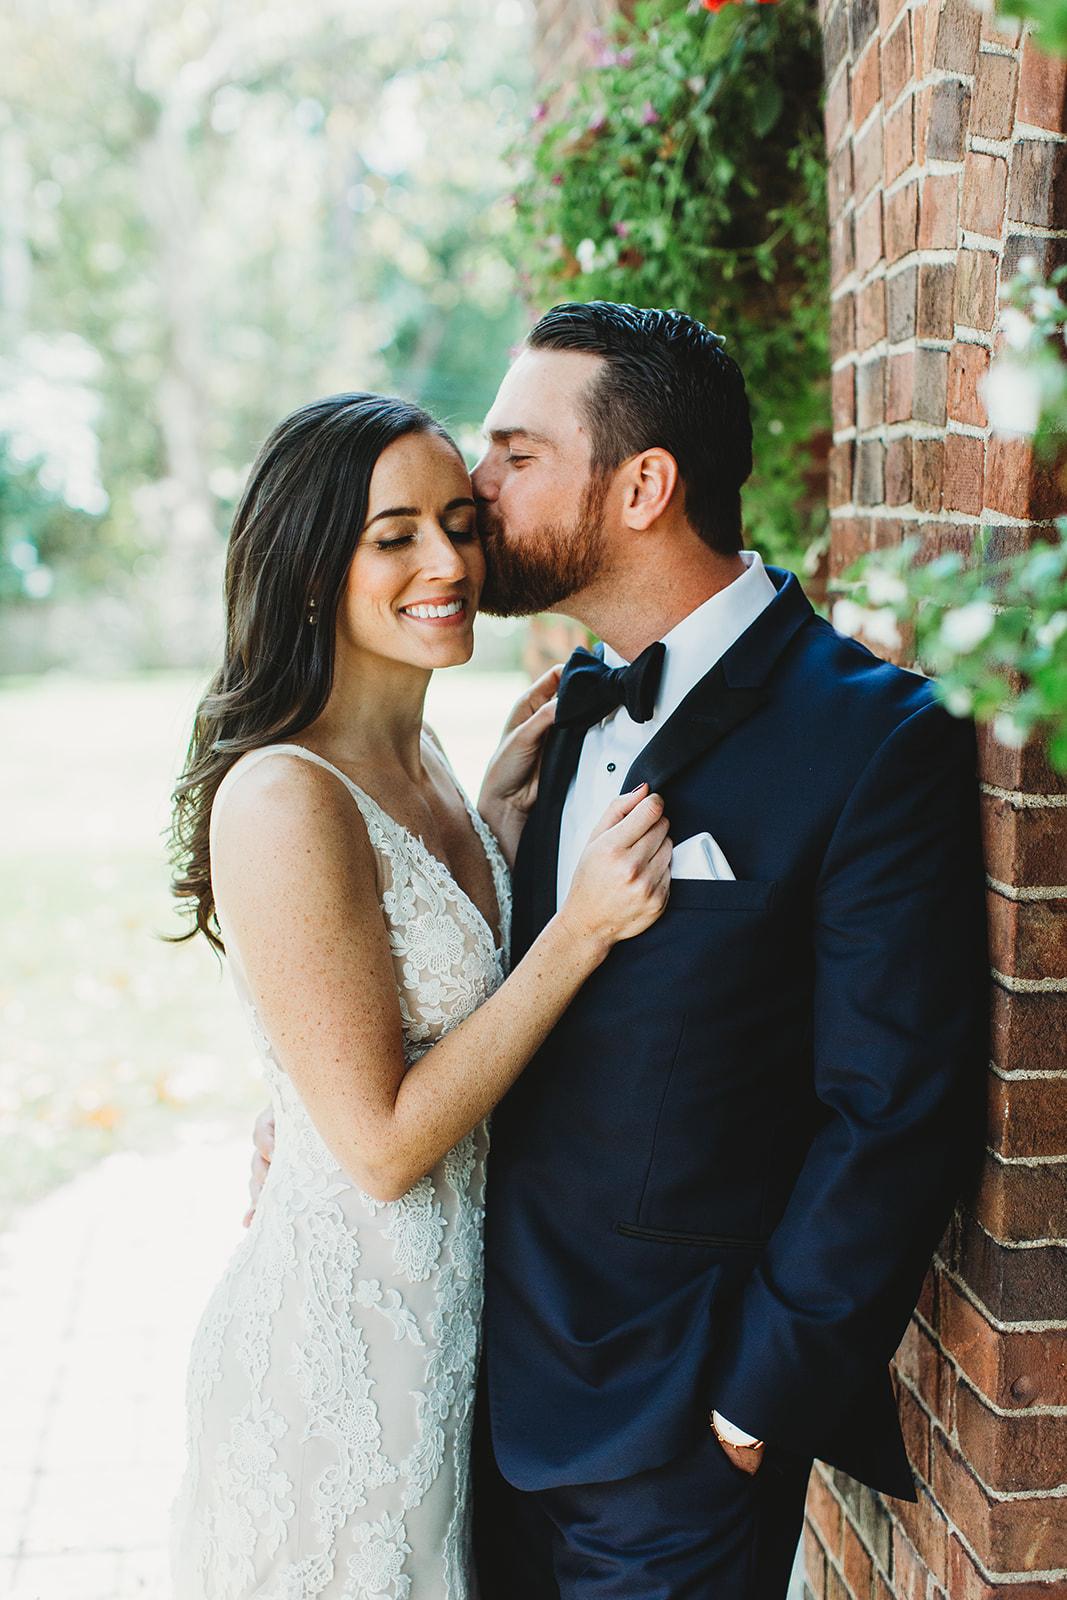 Ryan-Zarichnak-Photography-Pittsburgh-Susan-Evan-Wedding-2021.jpg